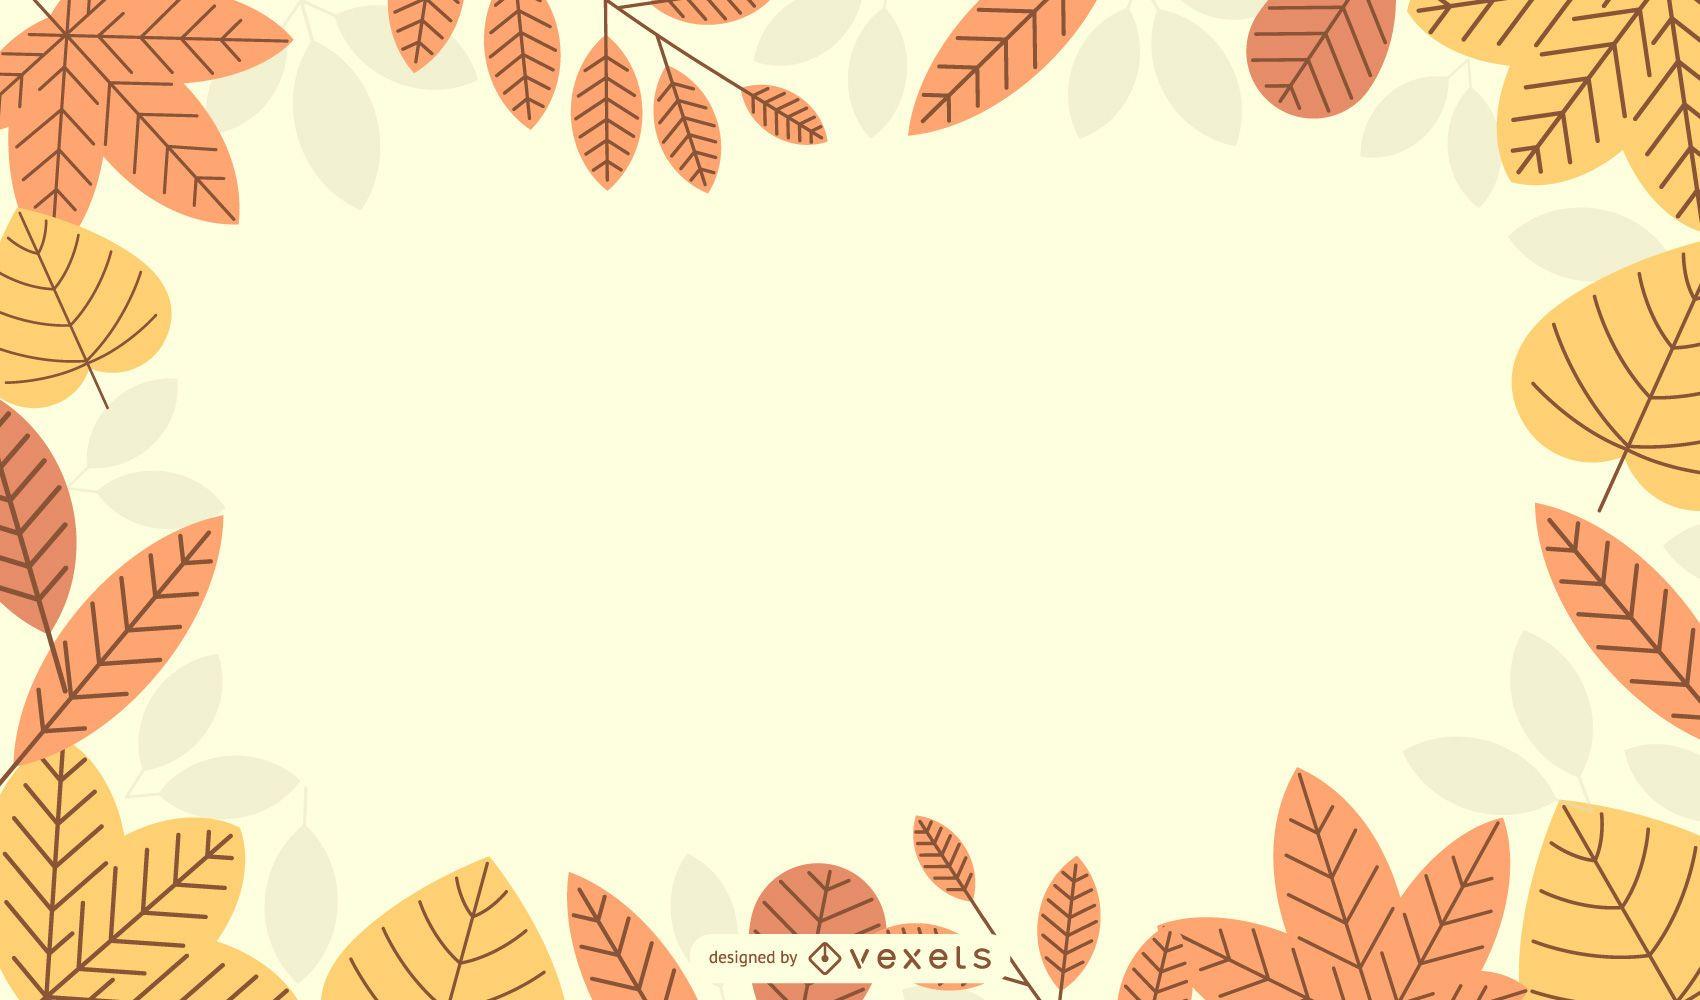 Diseño de fondo estacional de otoño